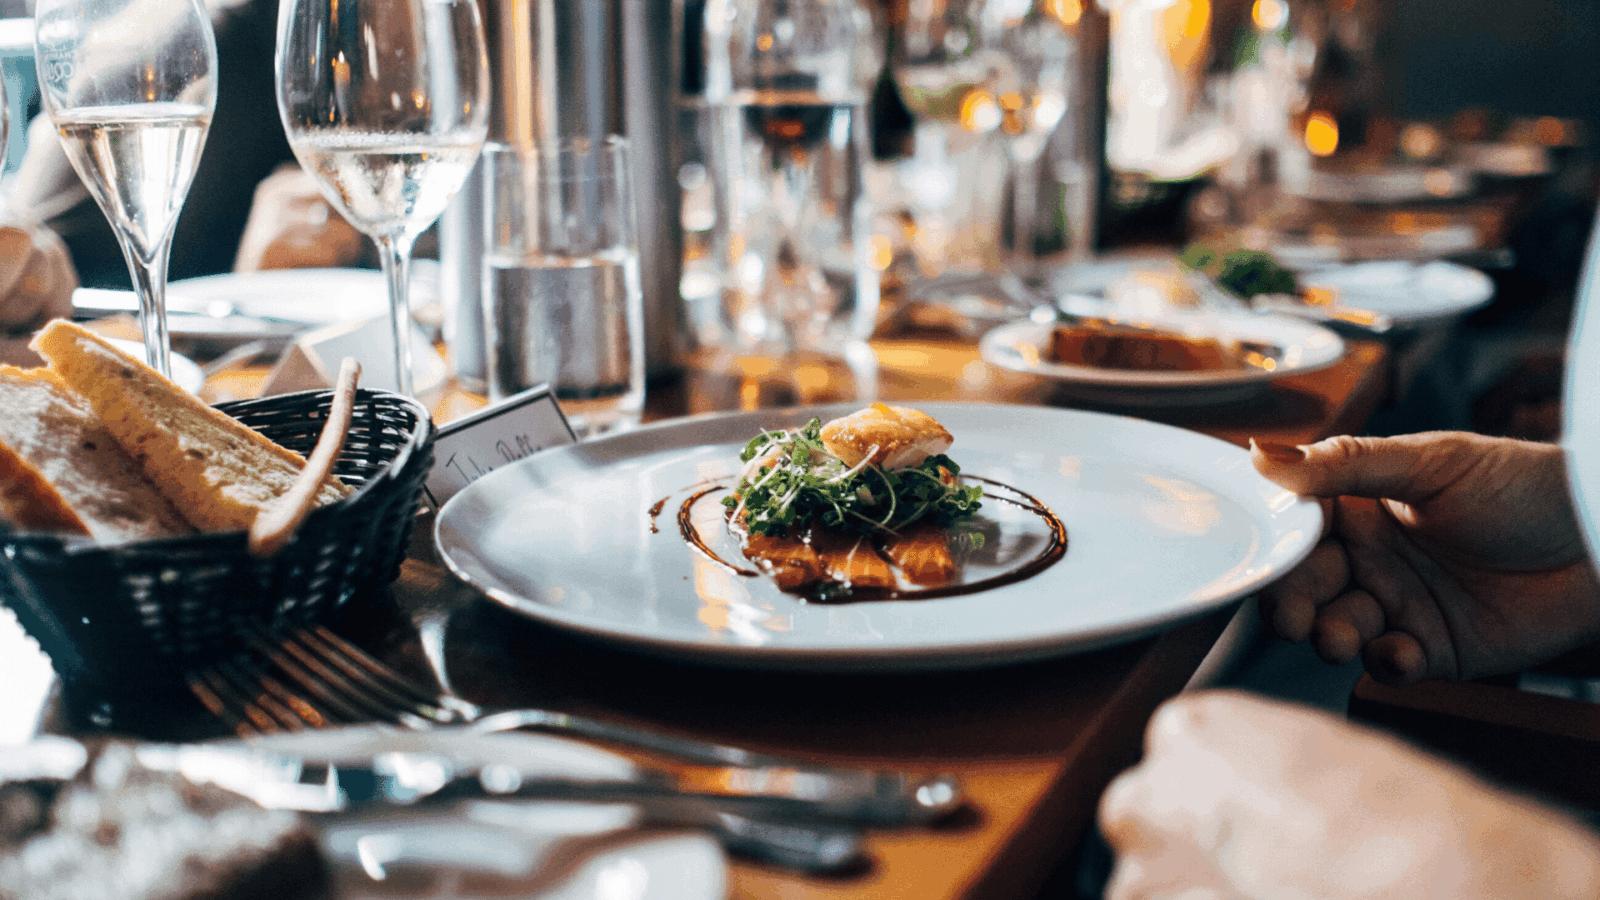 Understand How to Improve Restaurant Services